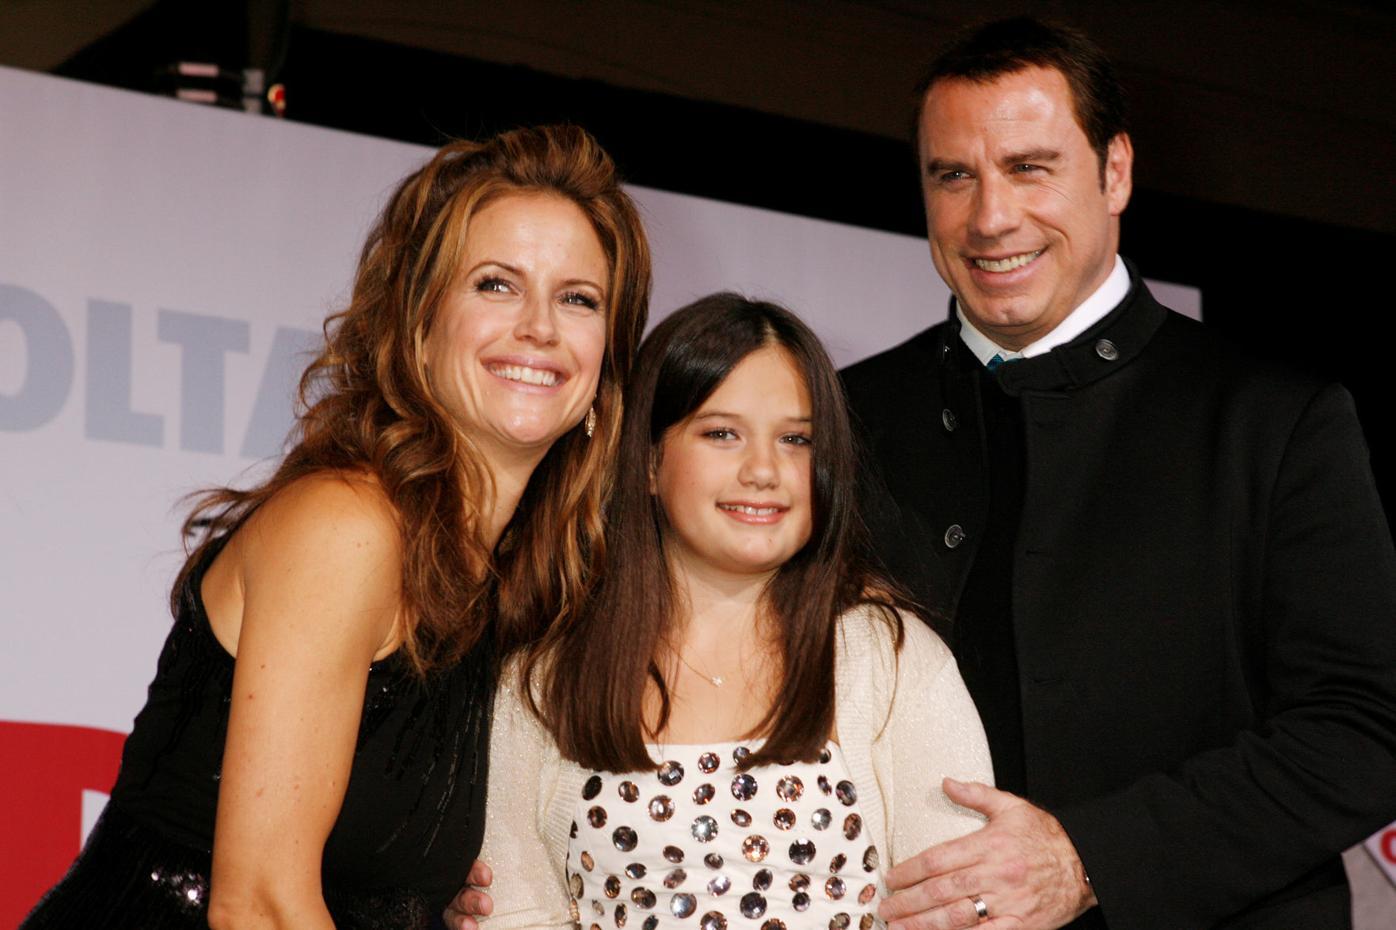 Actress Kelly Preston Wife Of John Travolta Dies At 57 Back Page Unionleader Com